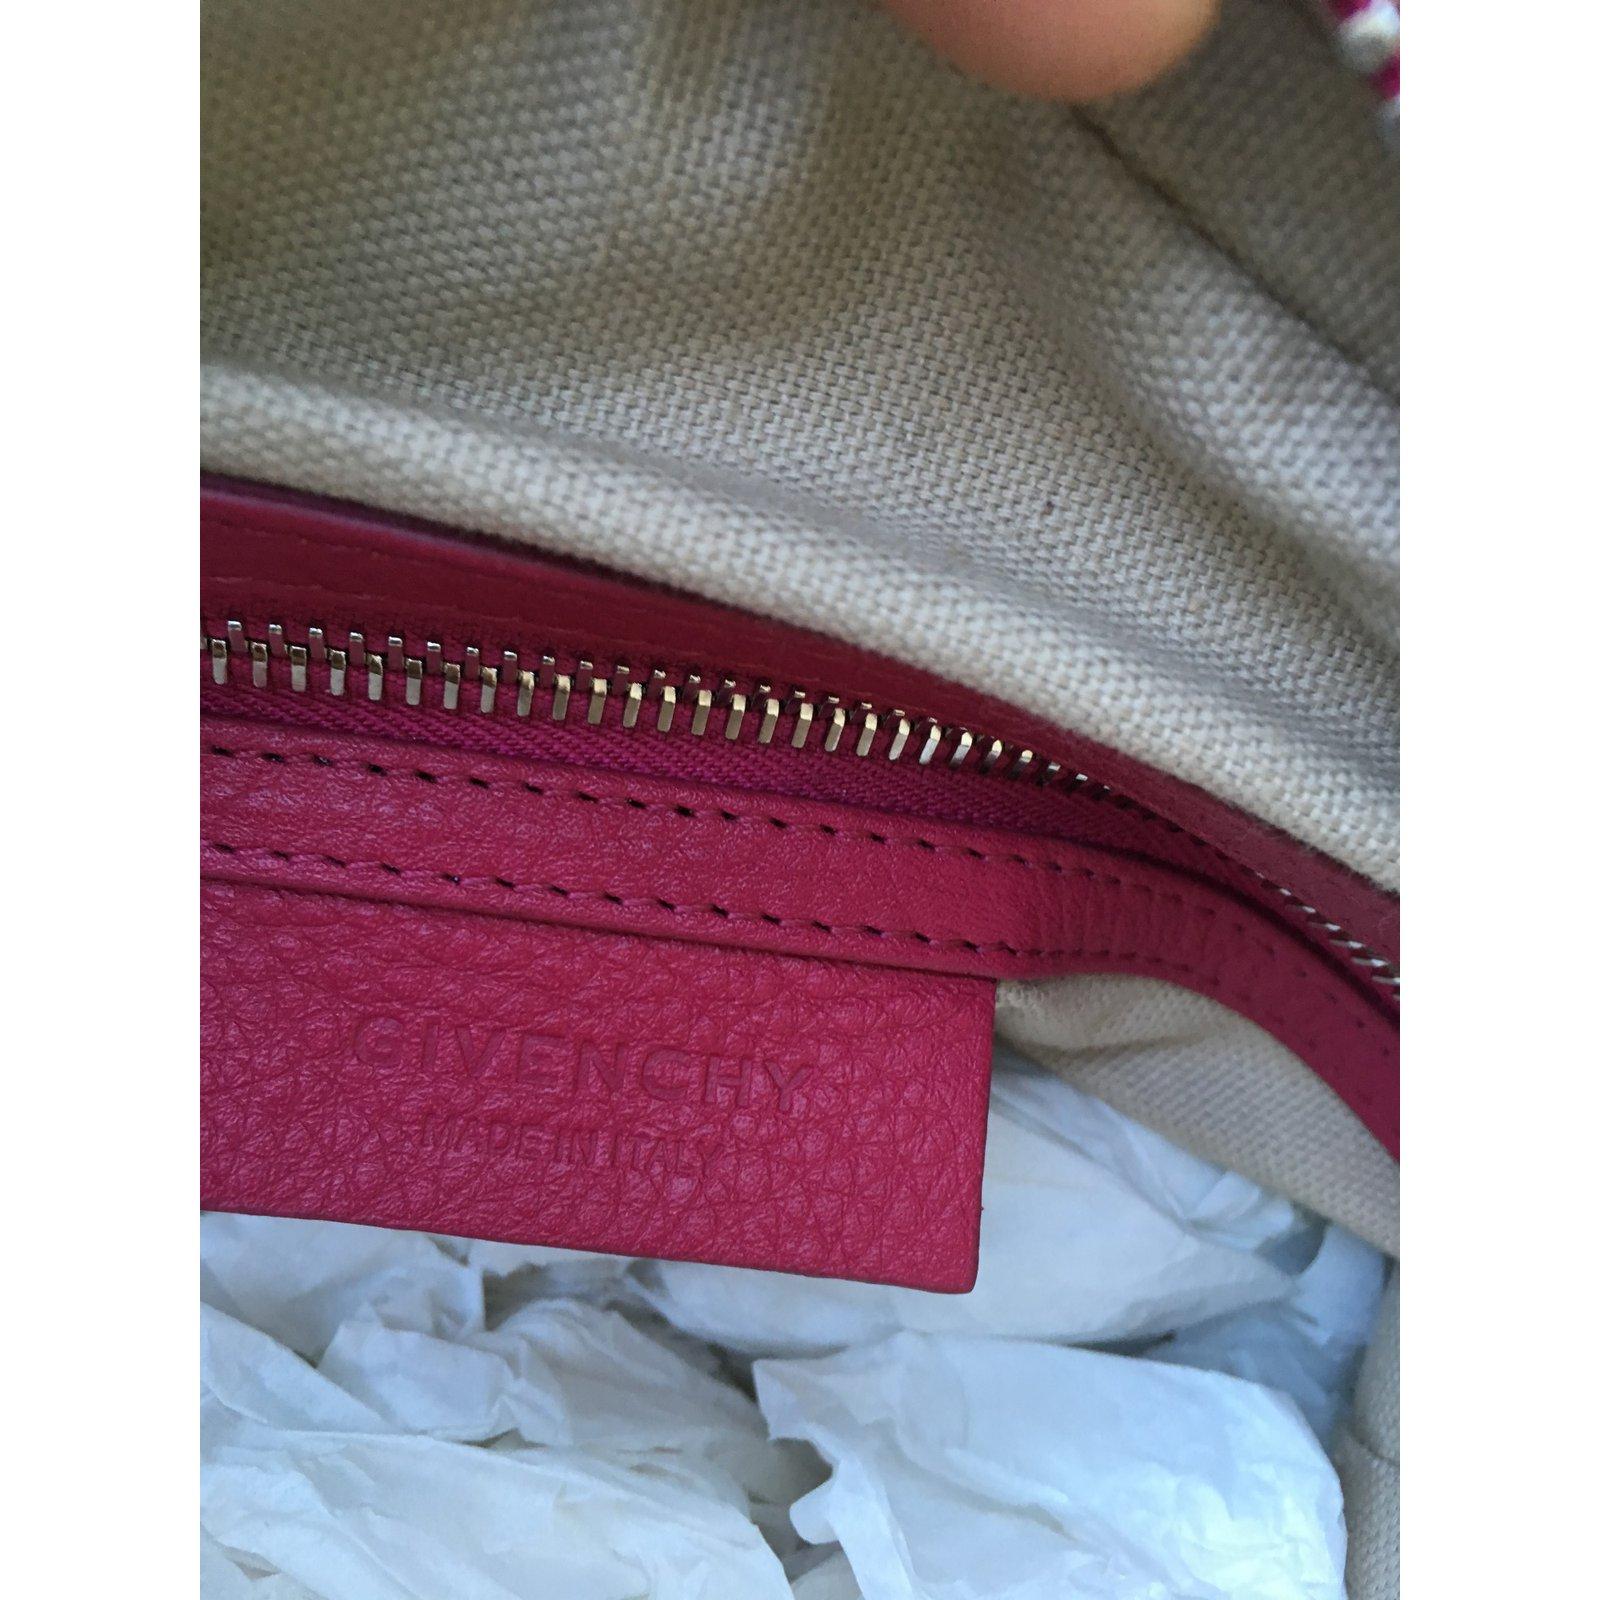 3c04336a47 Givenchy Nightingale Micro Handbags Leather Pink ref.68087 - Joli Closet